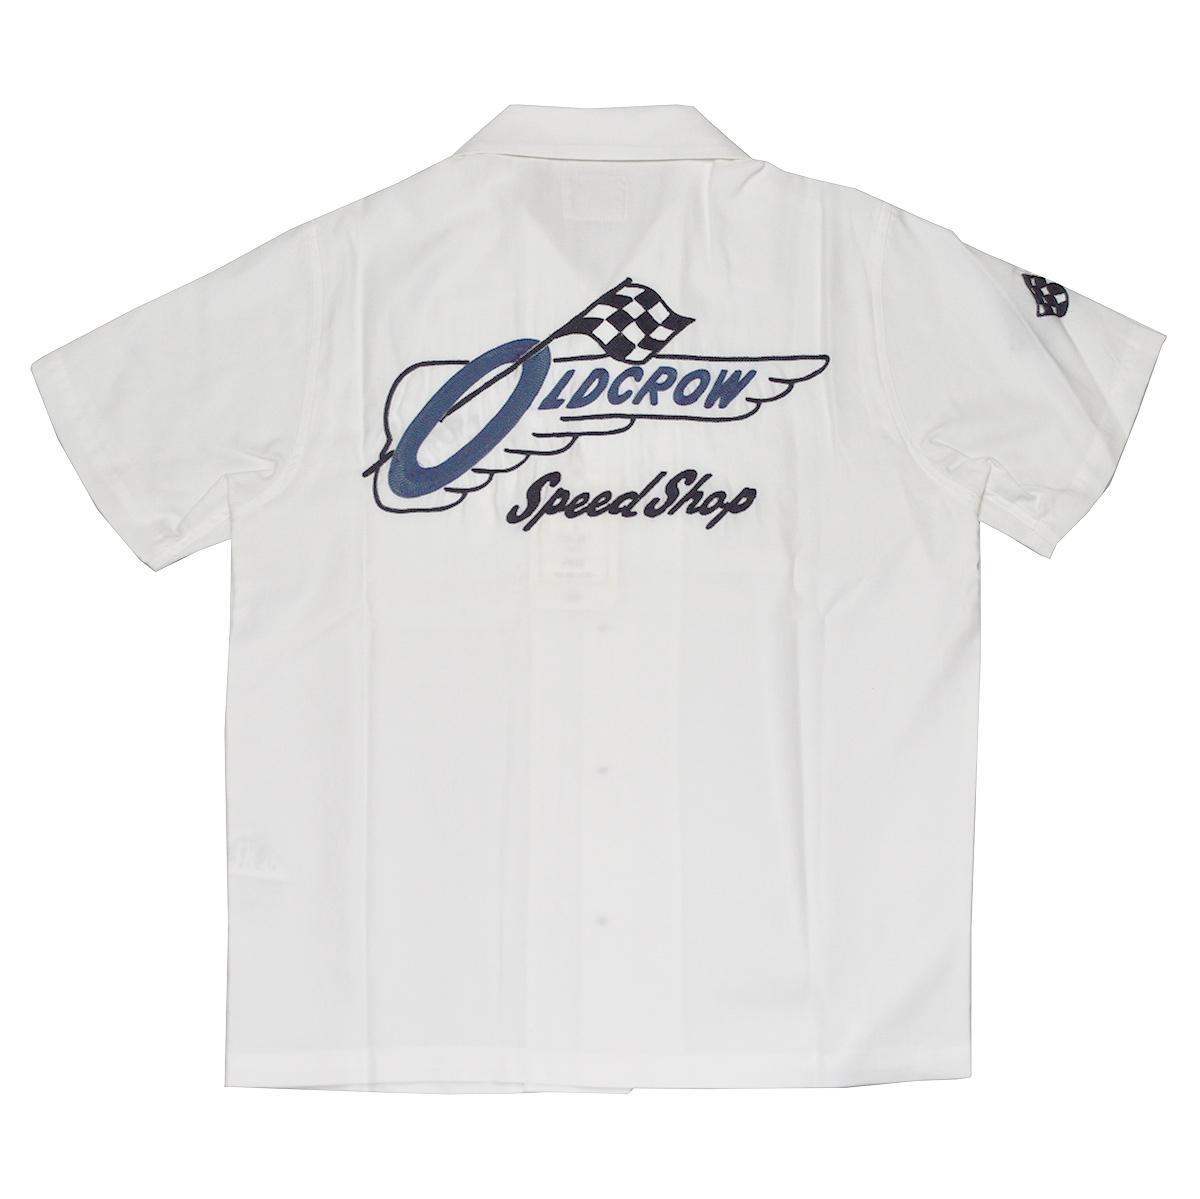 OLD CROW RACING - S/S SHIRTS (WHITE) オールドクロウ スピードショップ 半袖 オープンカラーシャツ/開襟シャツ/GLADHAND【GANGSTERVILLE/ギャングスタービル/WEIRDO/ウィアード】